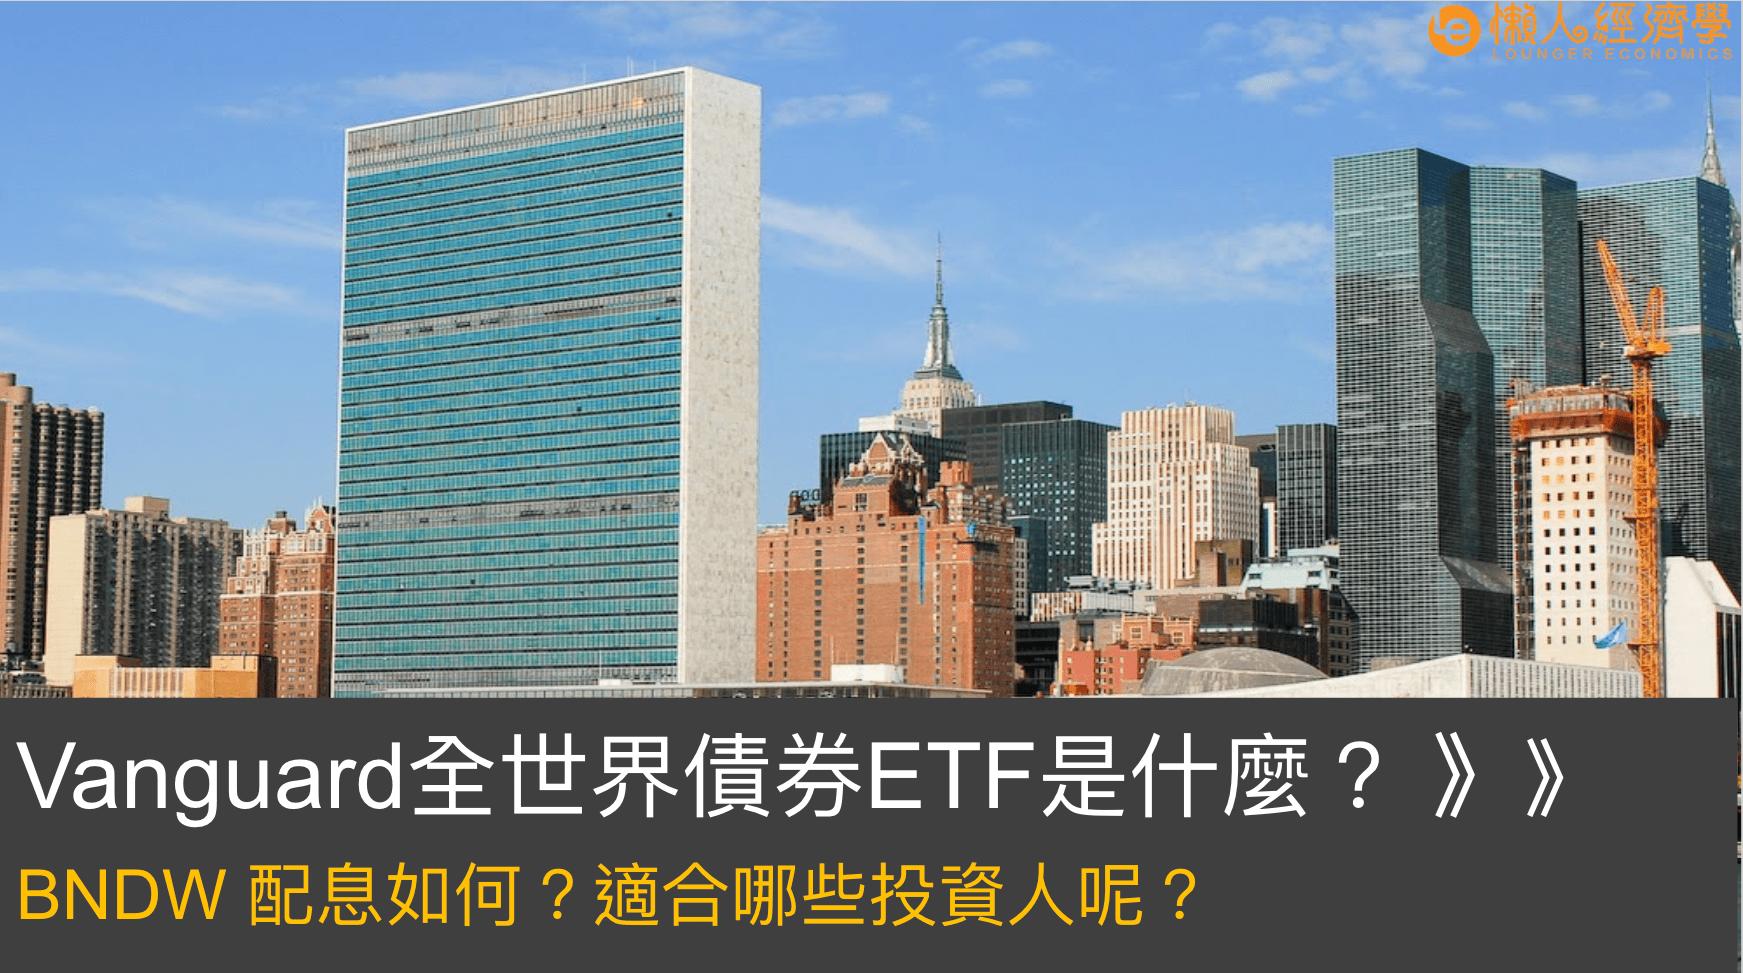 Vanguard全世界債券ETF(BNDW)是什麼? BNDW 配息如何?適合哪些投資人呢?